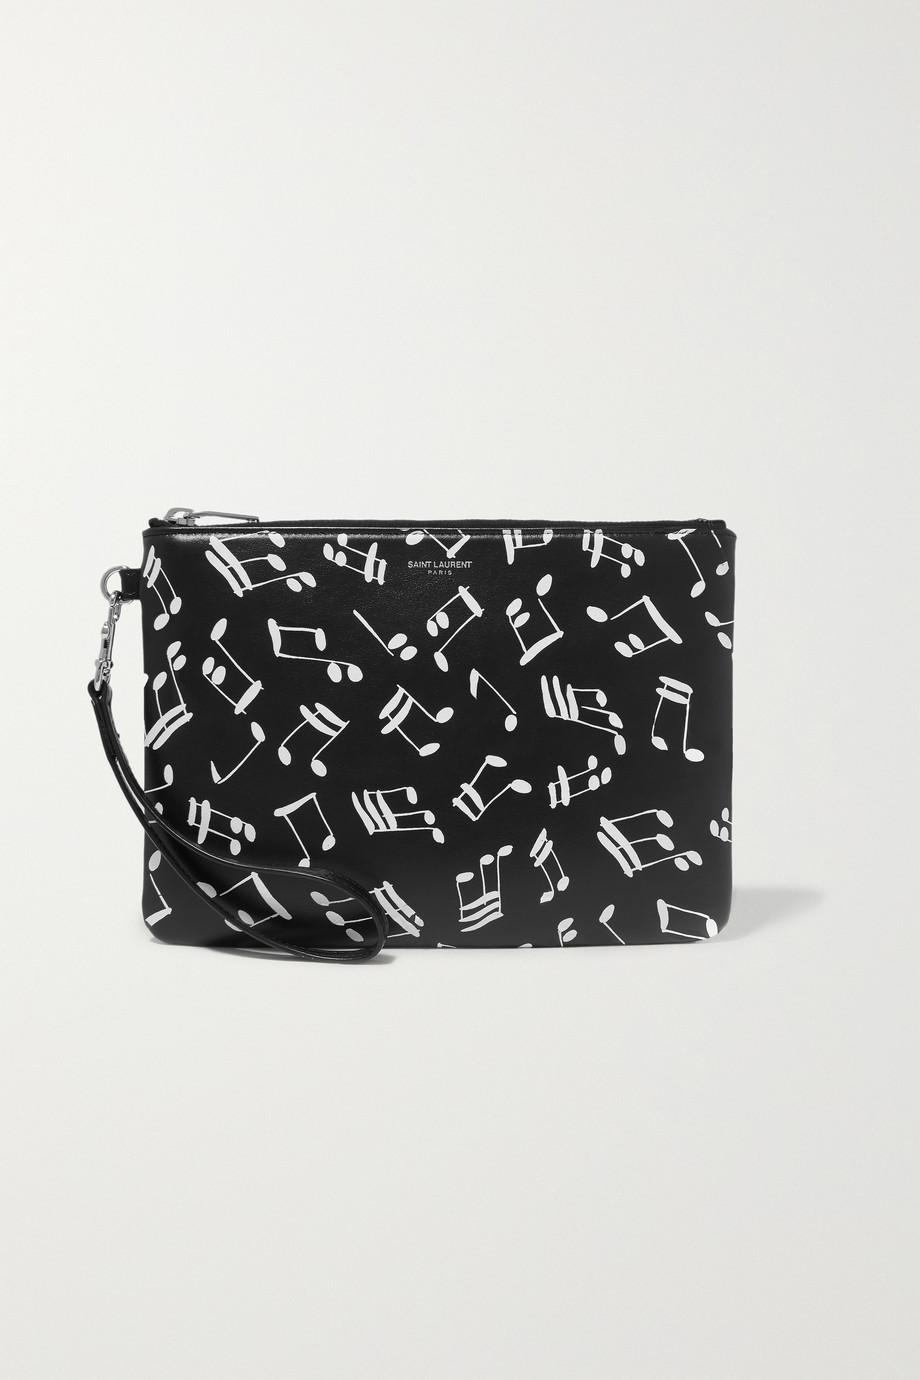 SAINT LAURENT Printed leather pouch